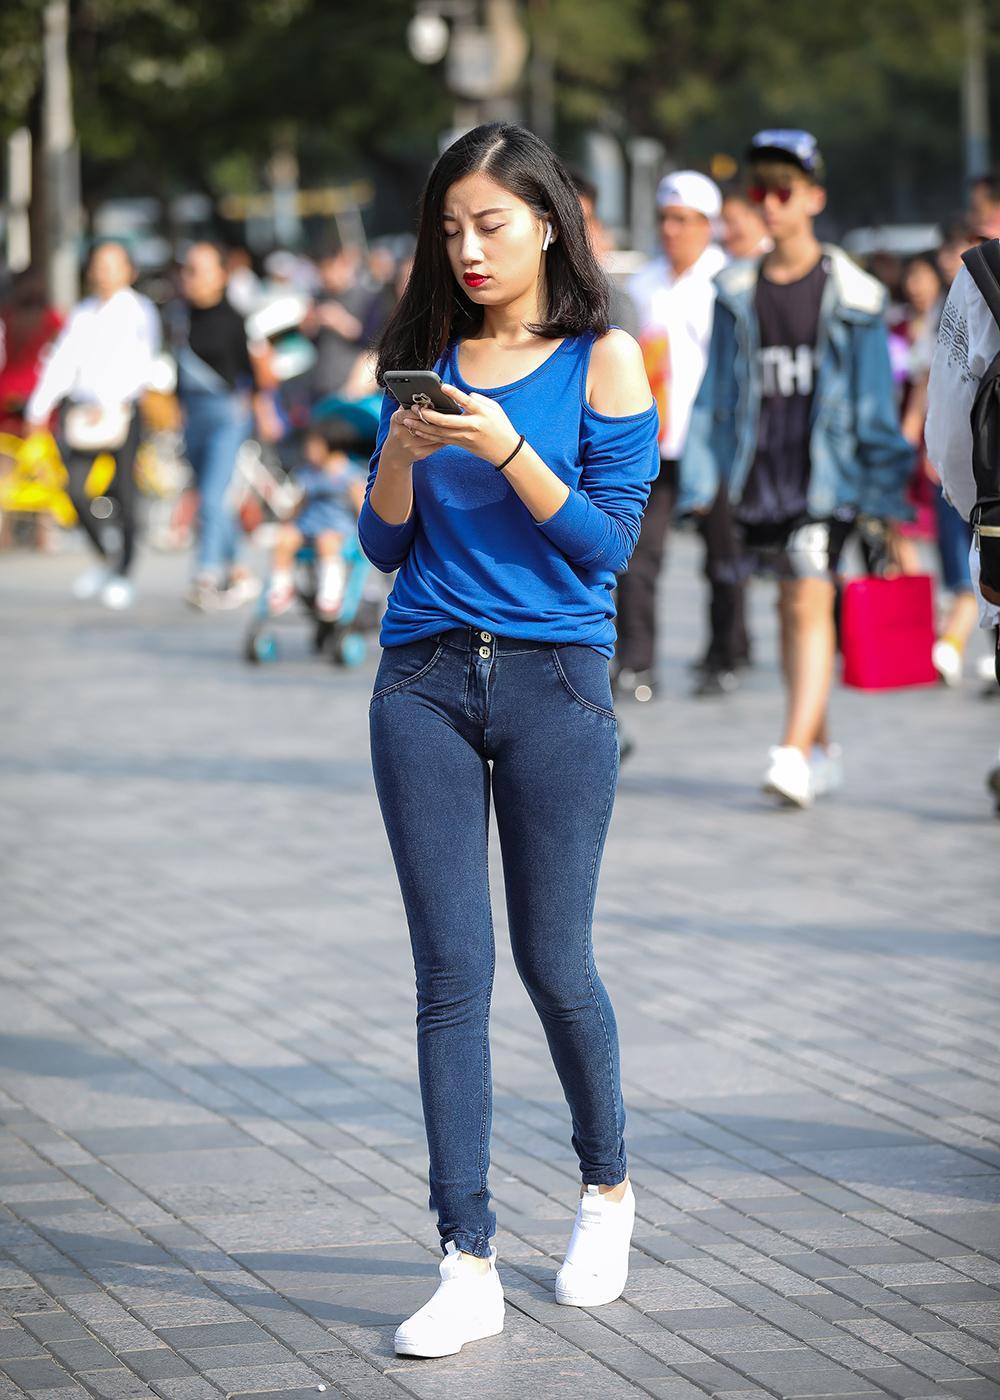 3D成人电影下载_街拍大街上紧身牛仔裤小姐姐【21P】-杏吧_性吧_sex8_杏吧有你 ...